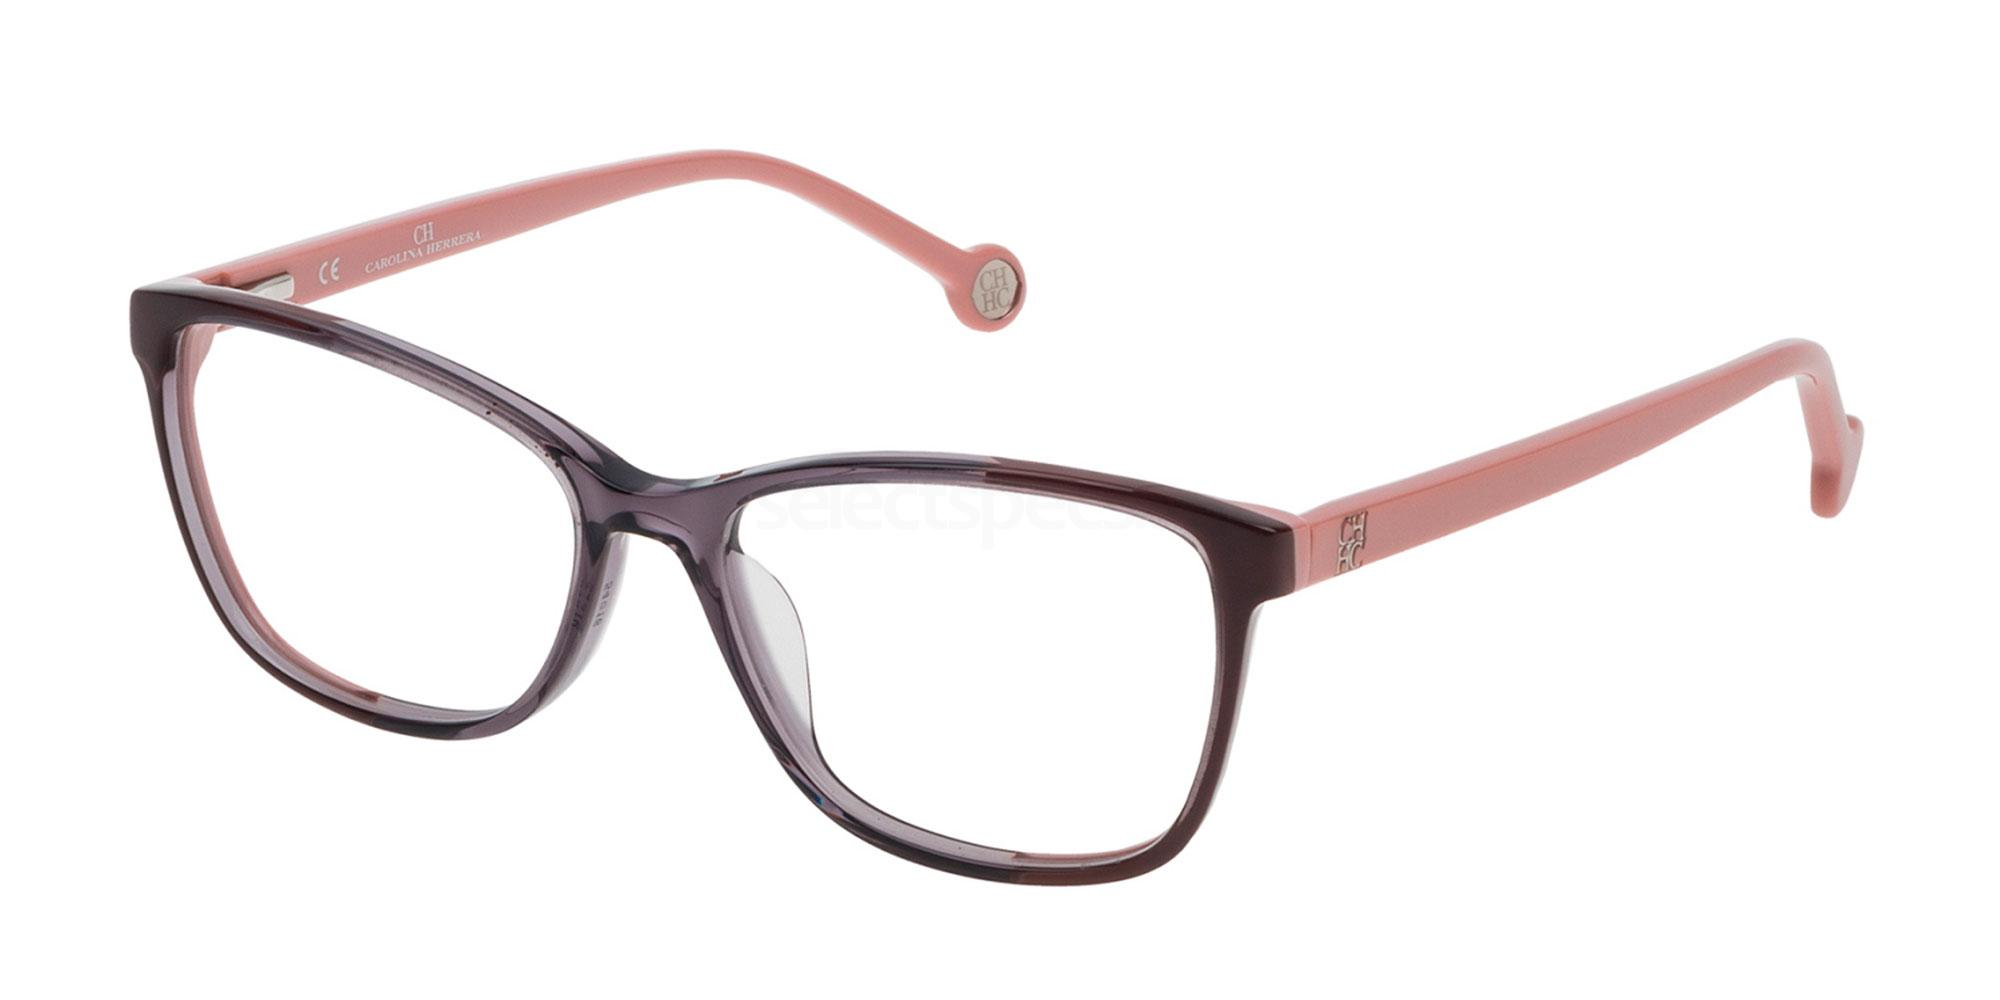 0AAU VHE717 Glasses, CH Carolina Herrera